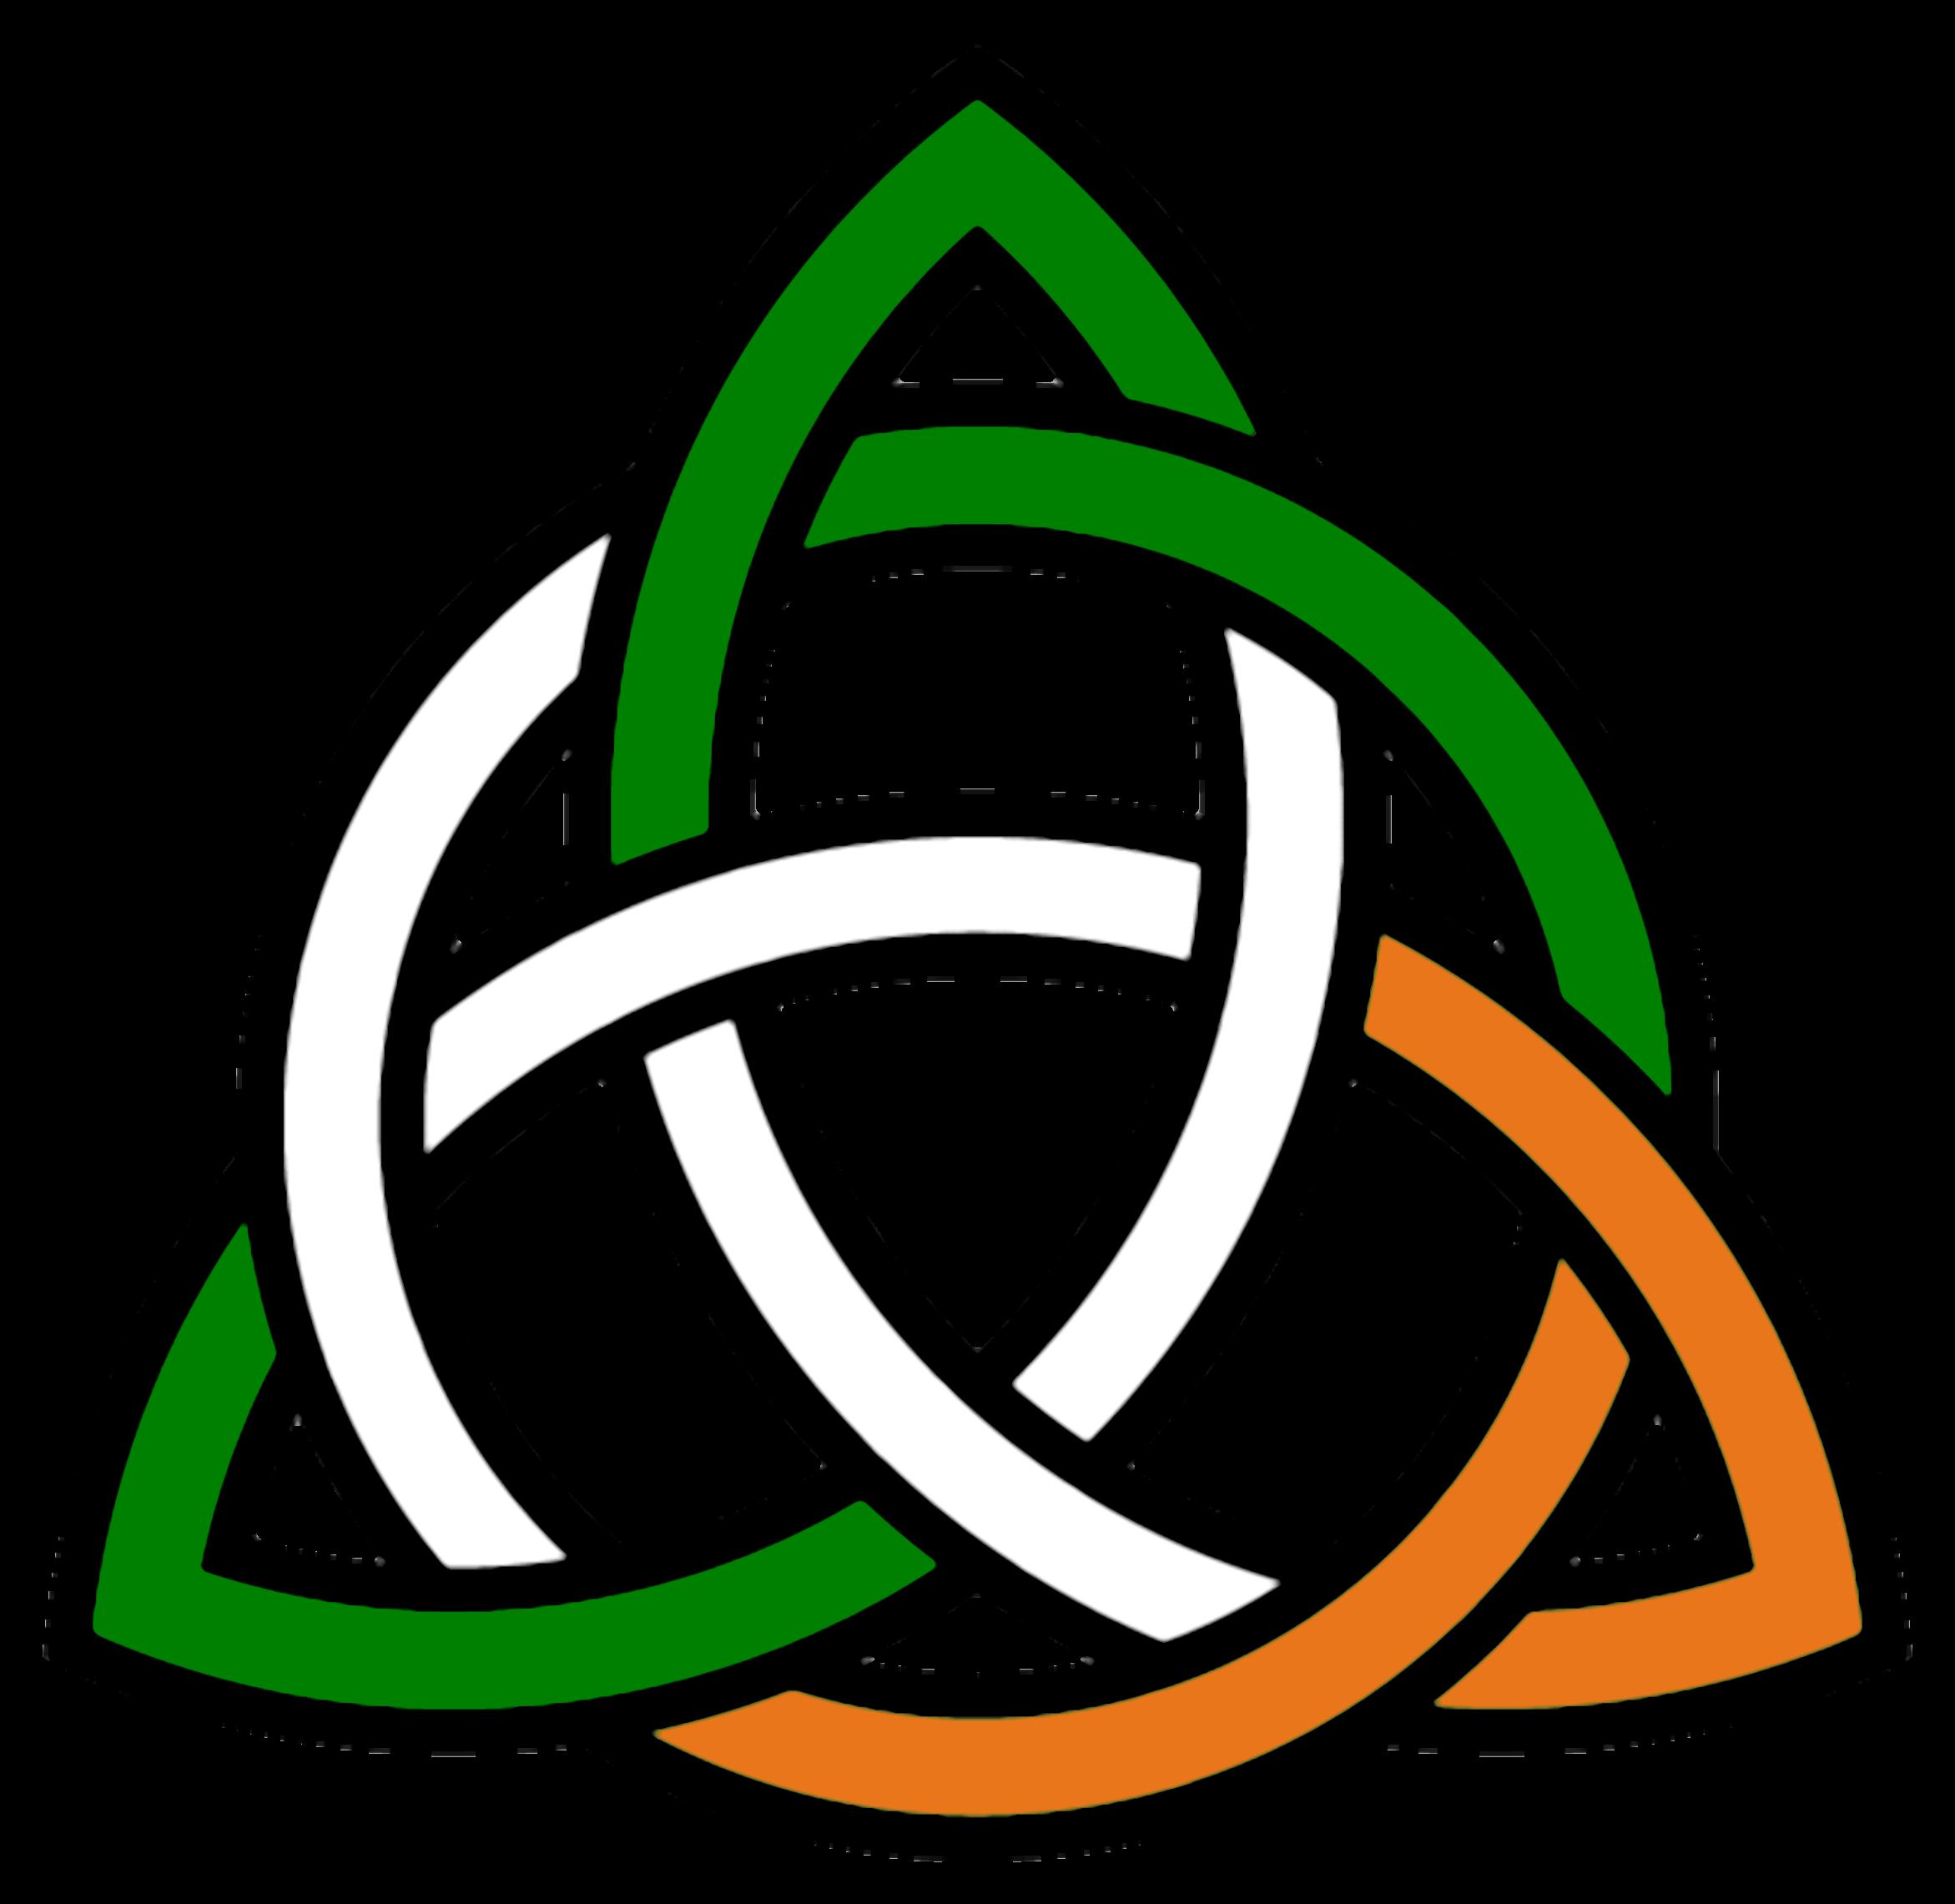 Celtic Trinity Knot Clipart Irish Knot Flag Image Vector Tatoos